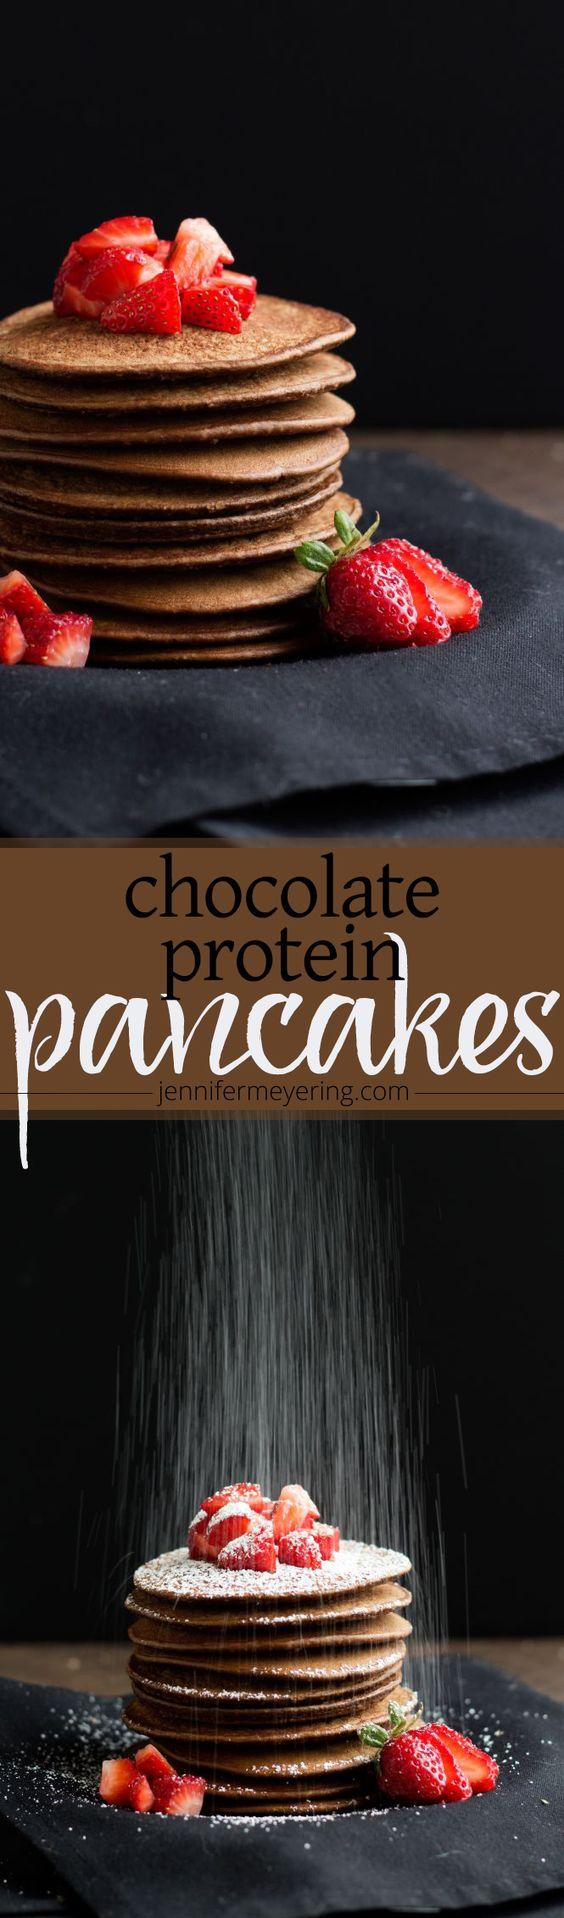 Chocolate Protein Pancakes -- JenniferMeyering.com #BestLifeProject #ad